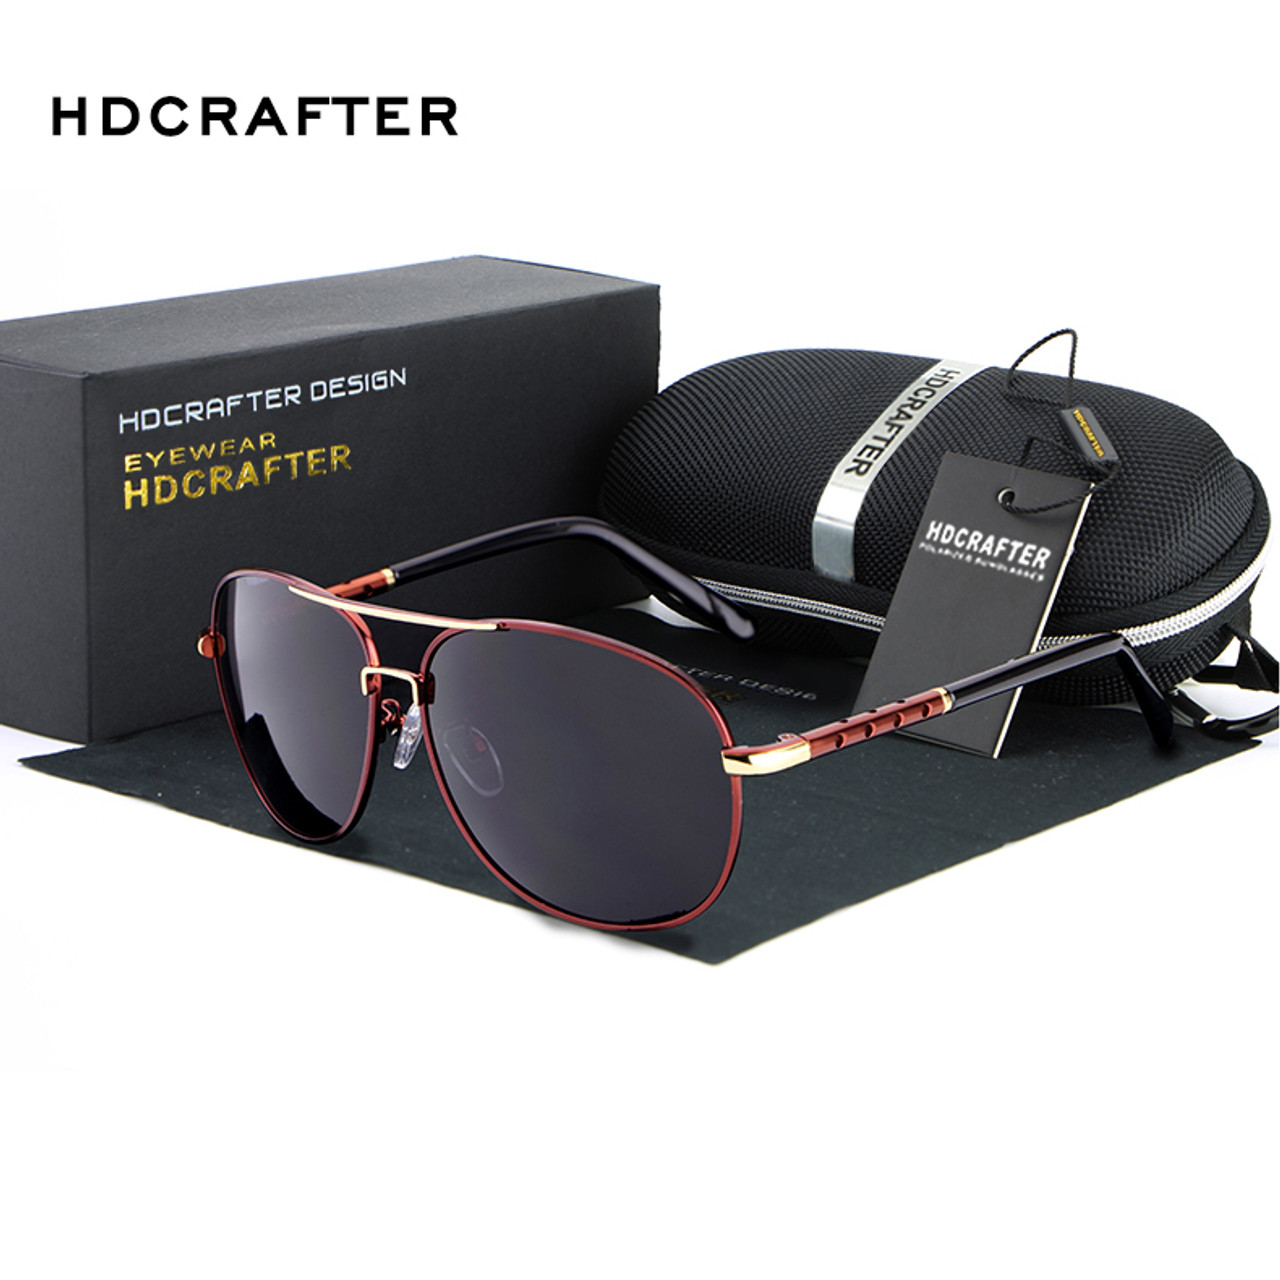 8b38c69ae8 ... HDCRAFTER Men Polarized Aviator Sunglasses New brand designer Aluminum  Magnesium Driving Male Fashion Sunglasses 2018 ...